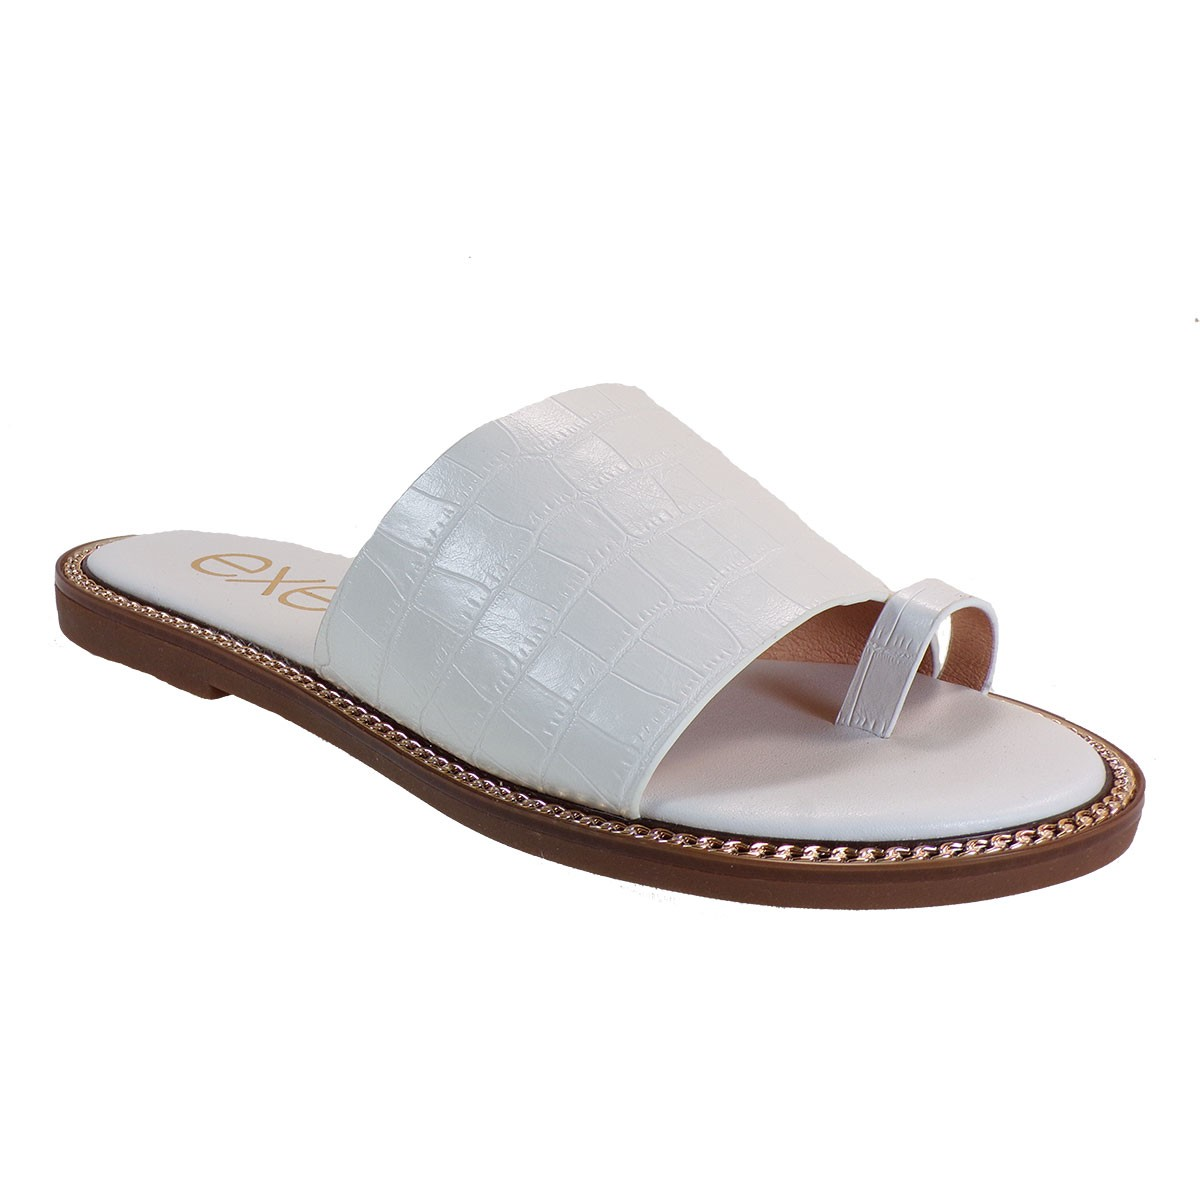 EXE Shoes Γυναικεία Παντόφλας ALEXIA-140 Λεύκο Κροκό M4700140125P